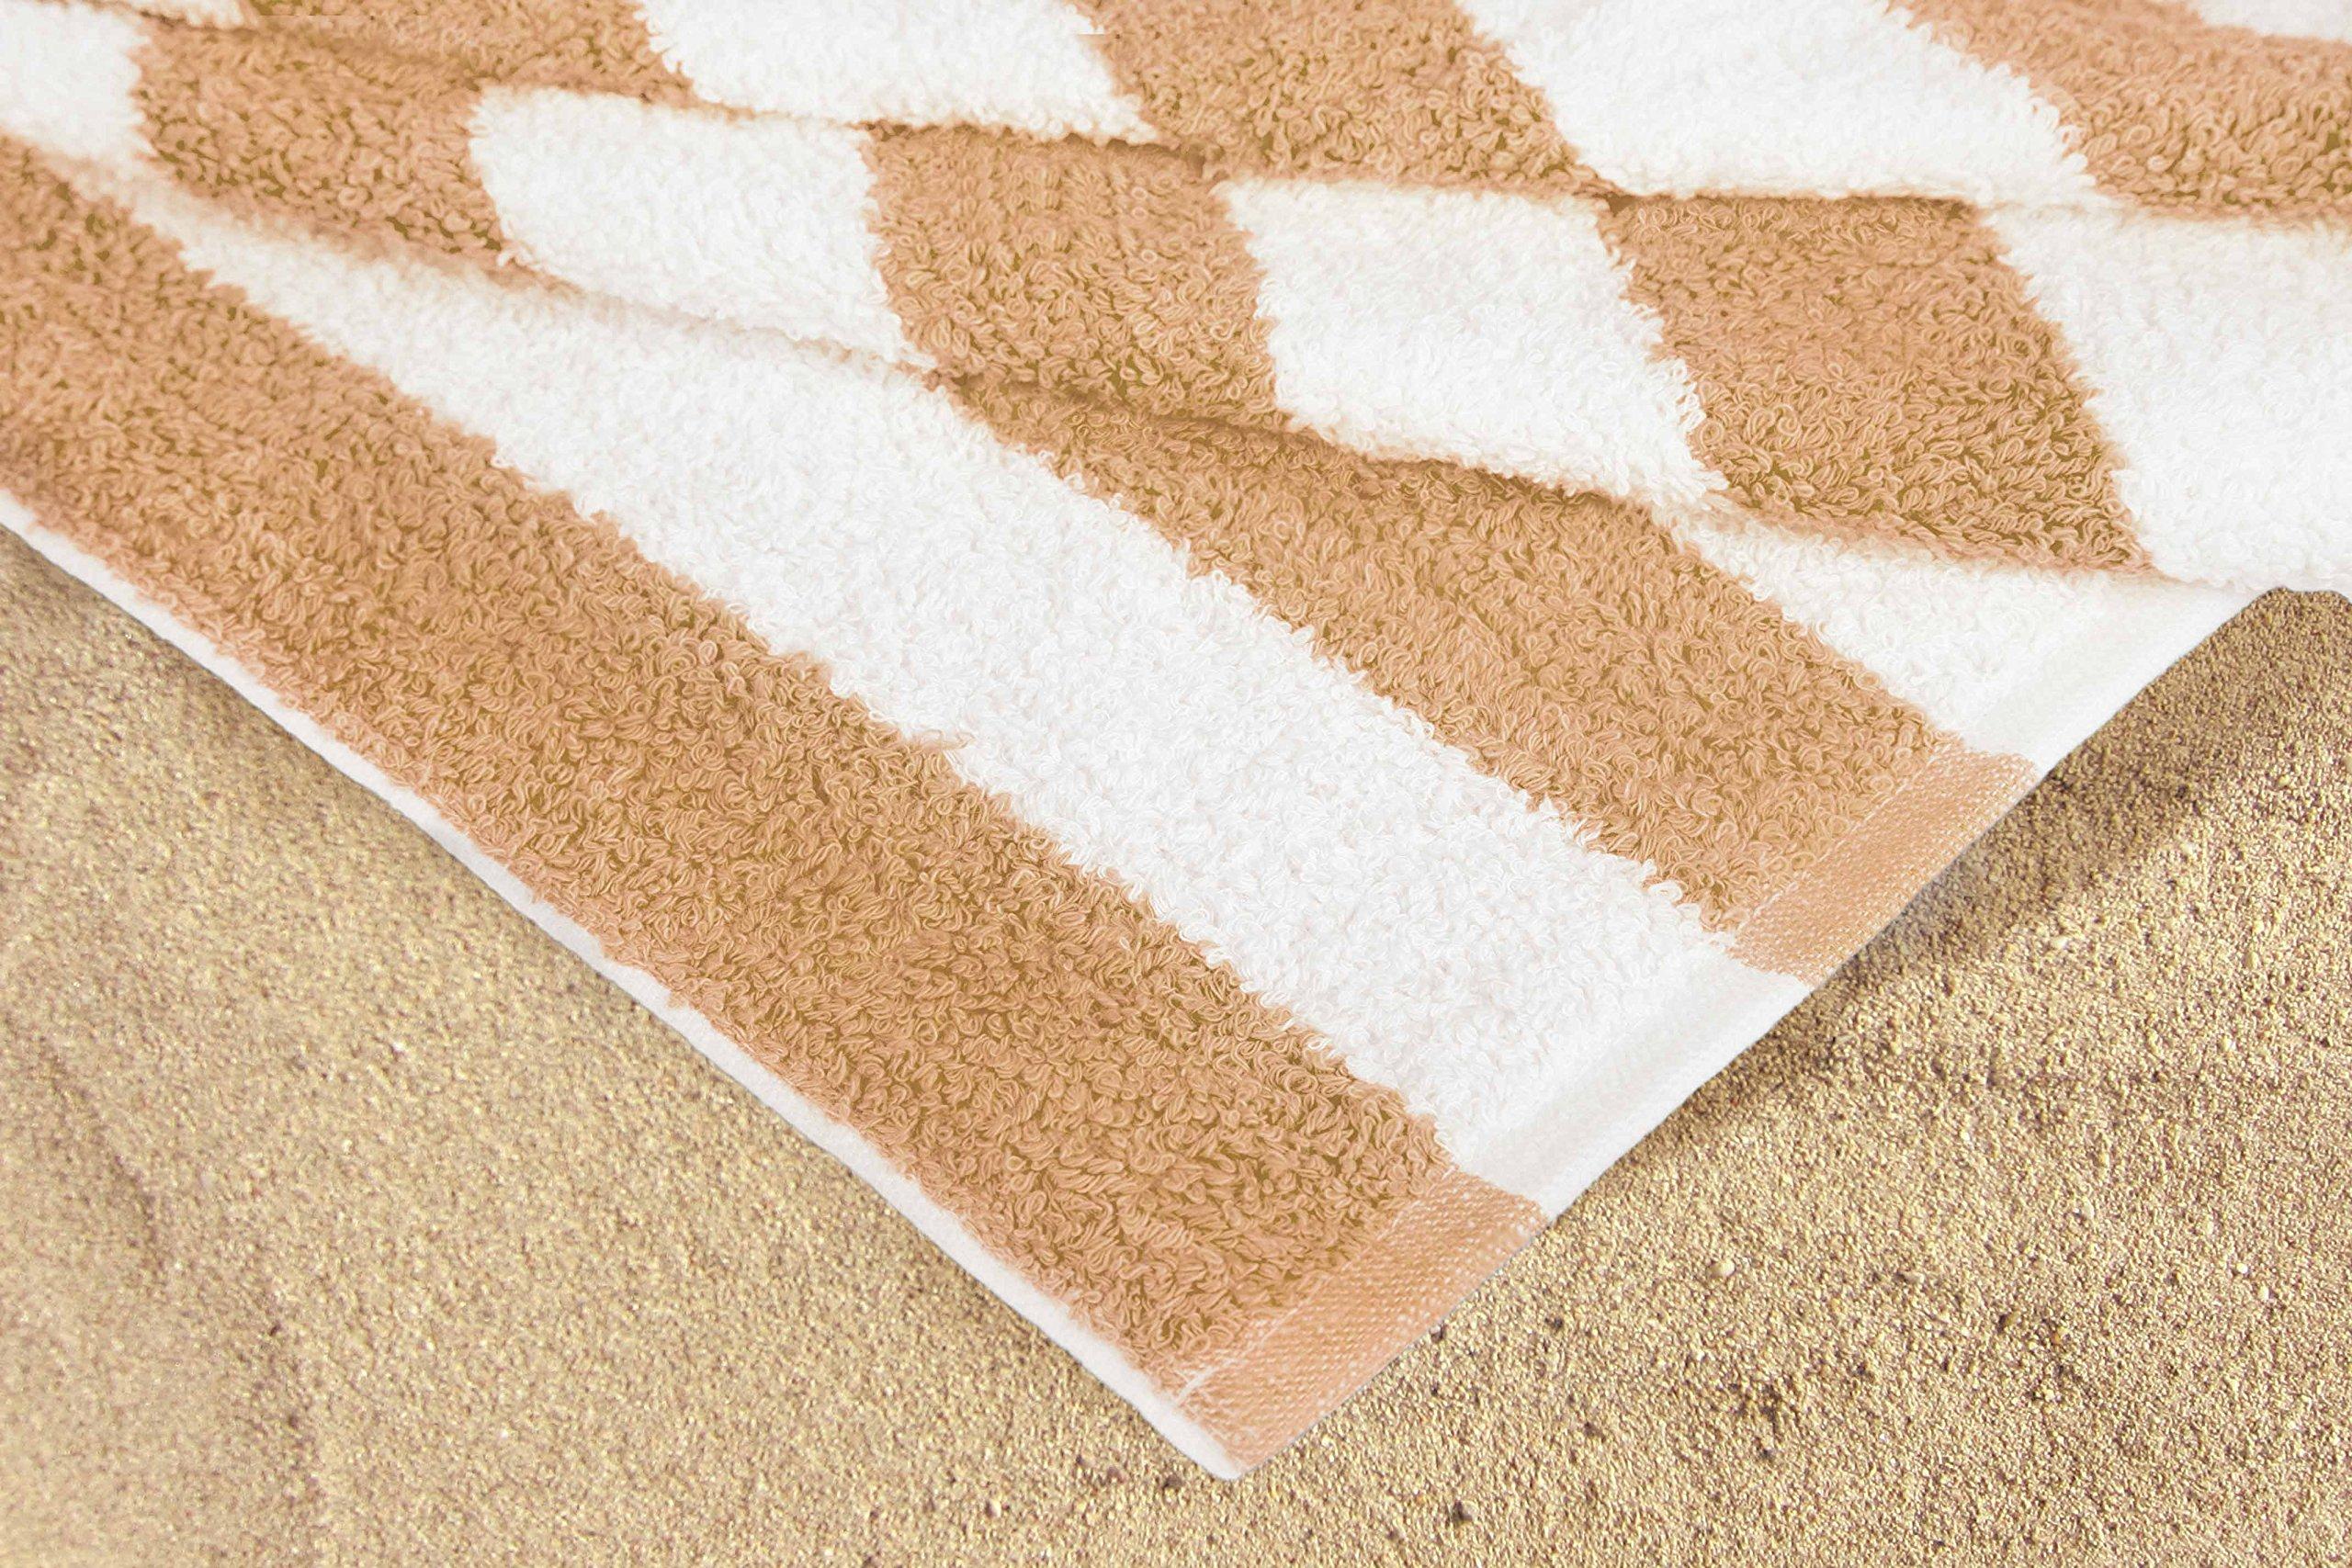 Cabana Stripe Towel - close up